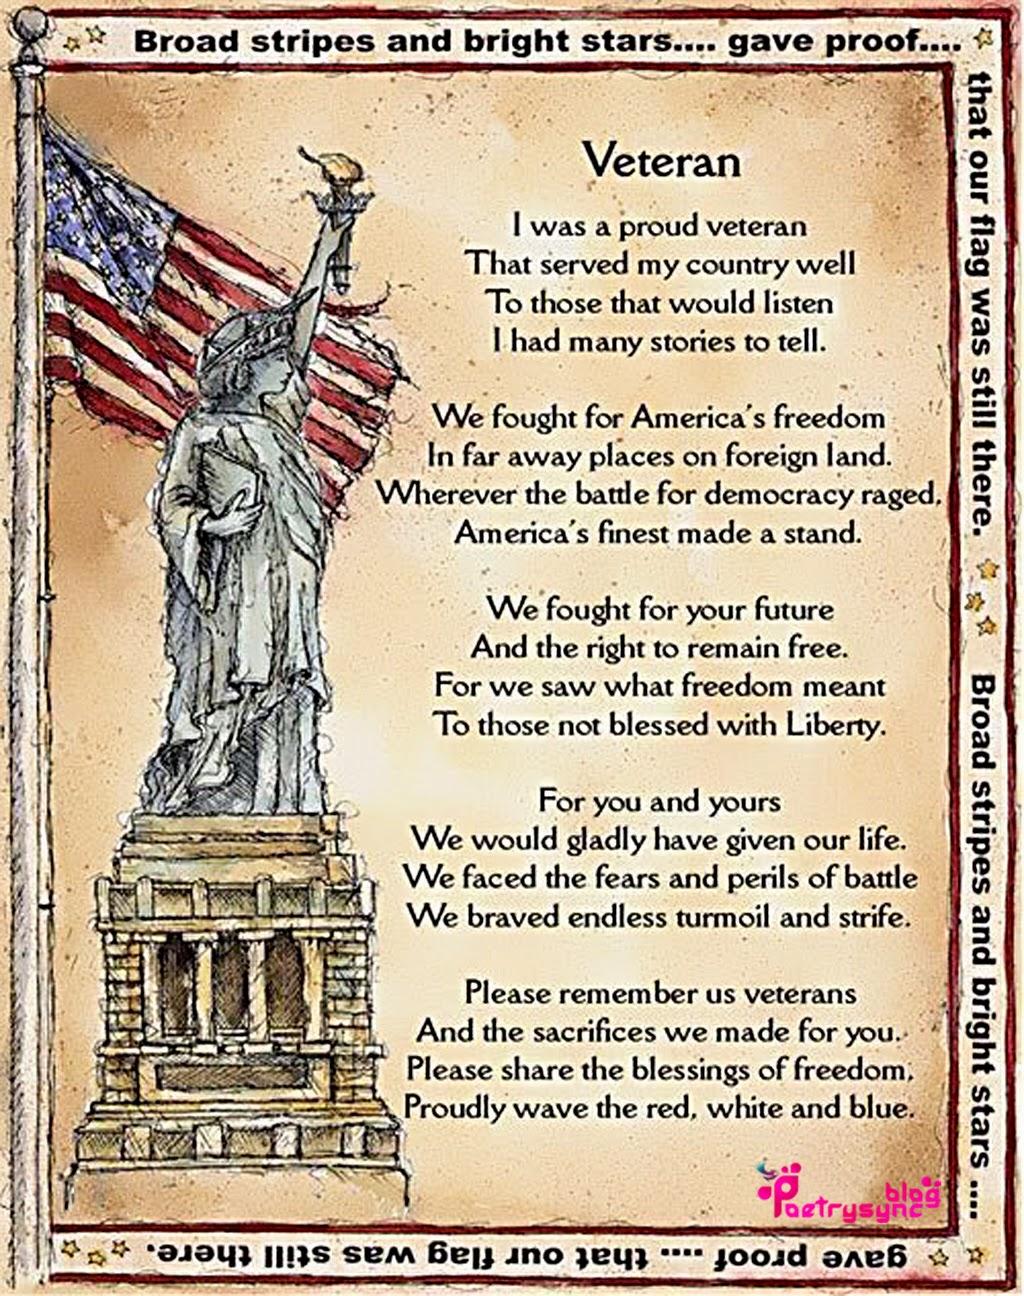 American Veteran Freedom Quotes